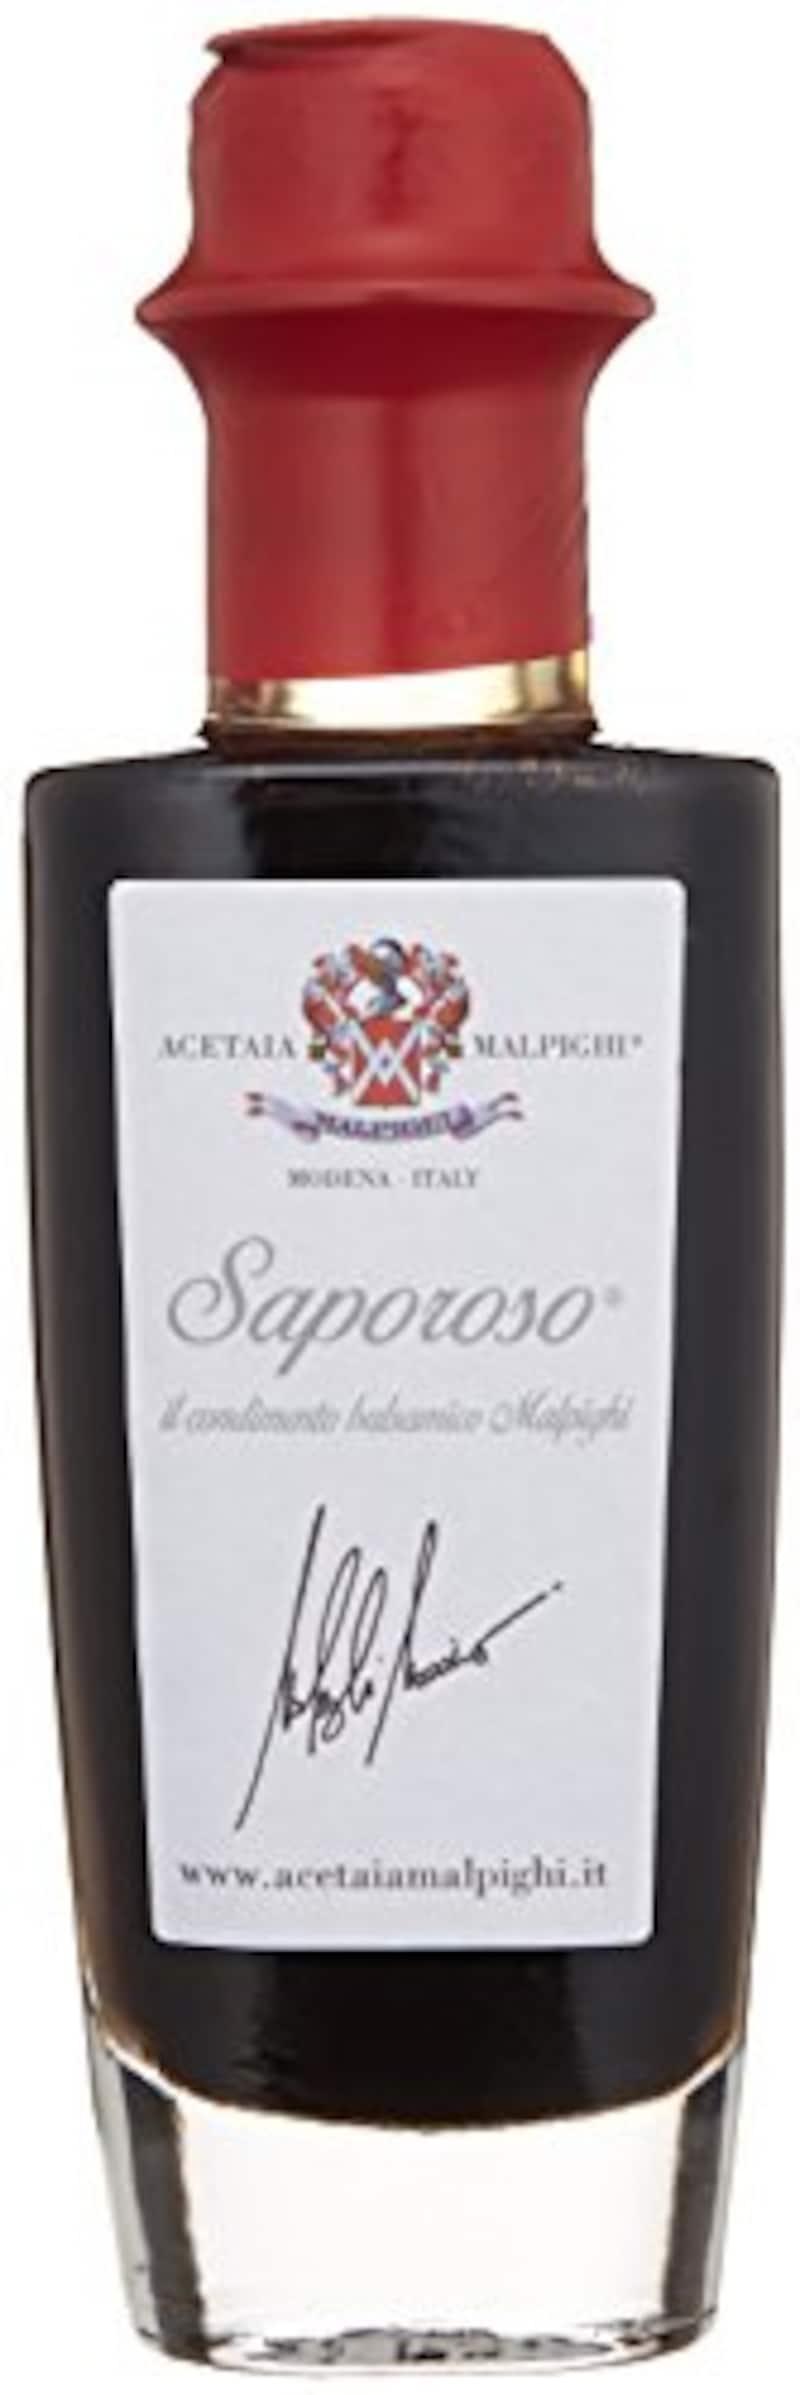 MALPIGHI(マルピーギ),サポローゾ